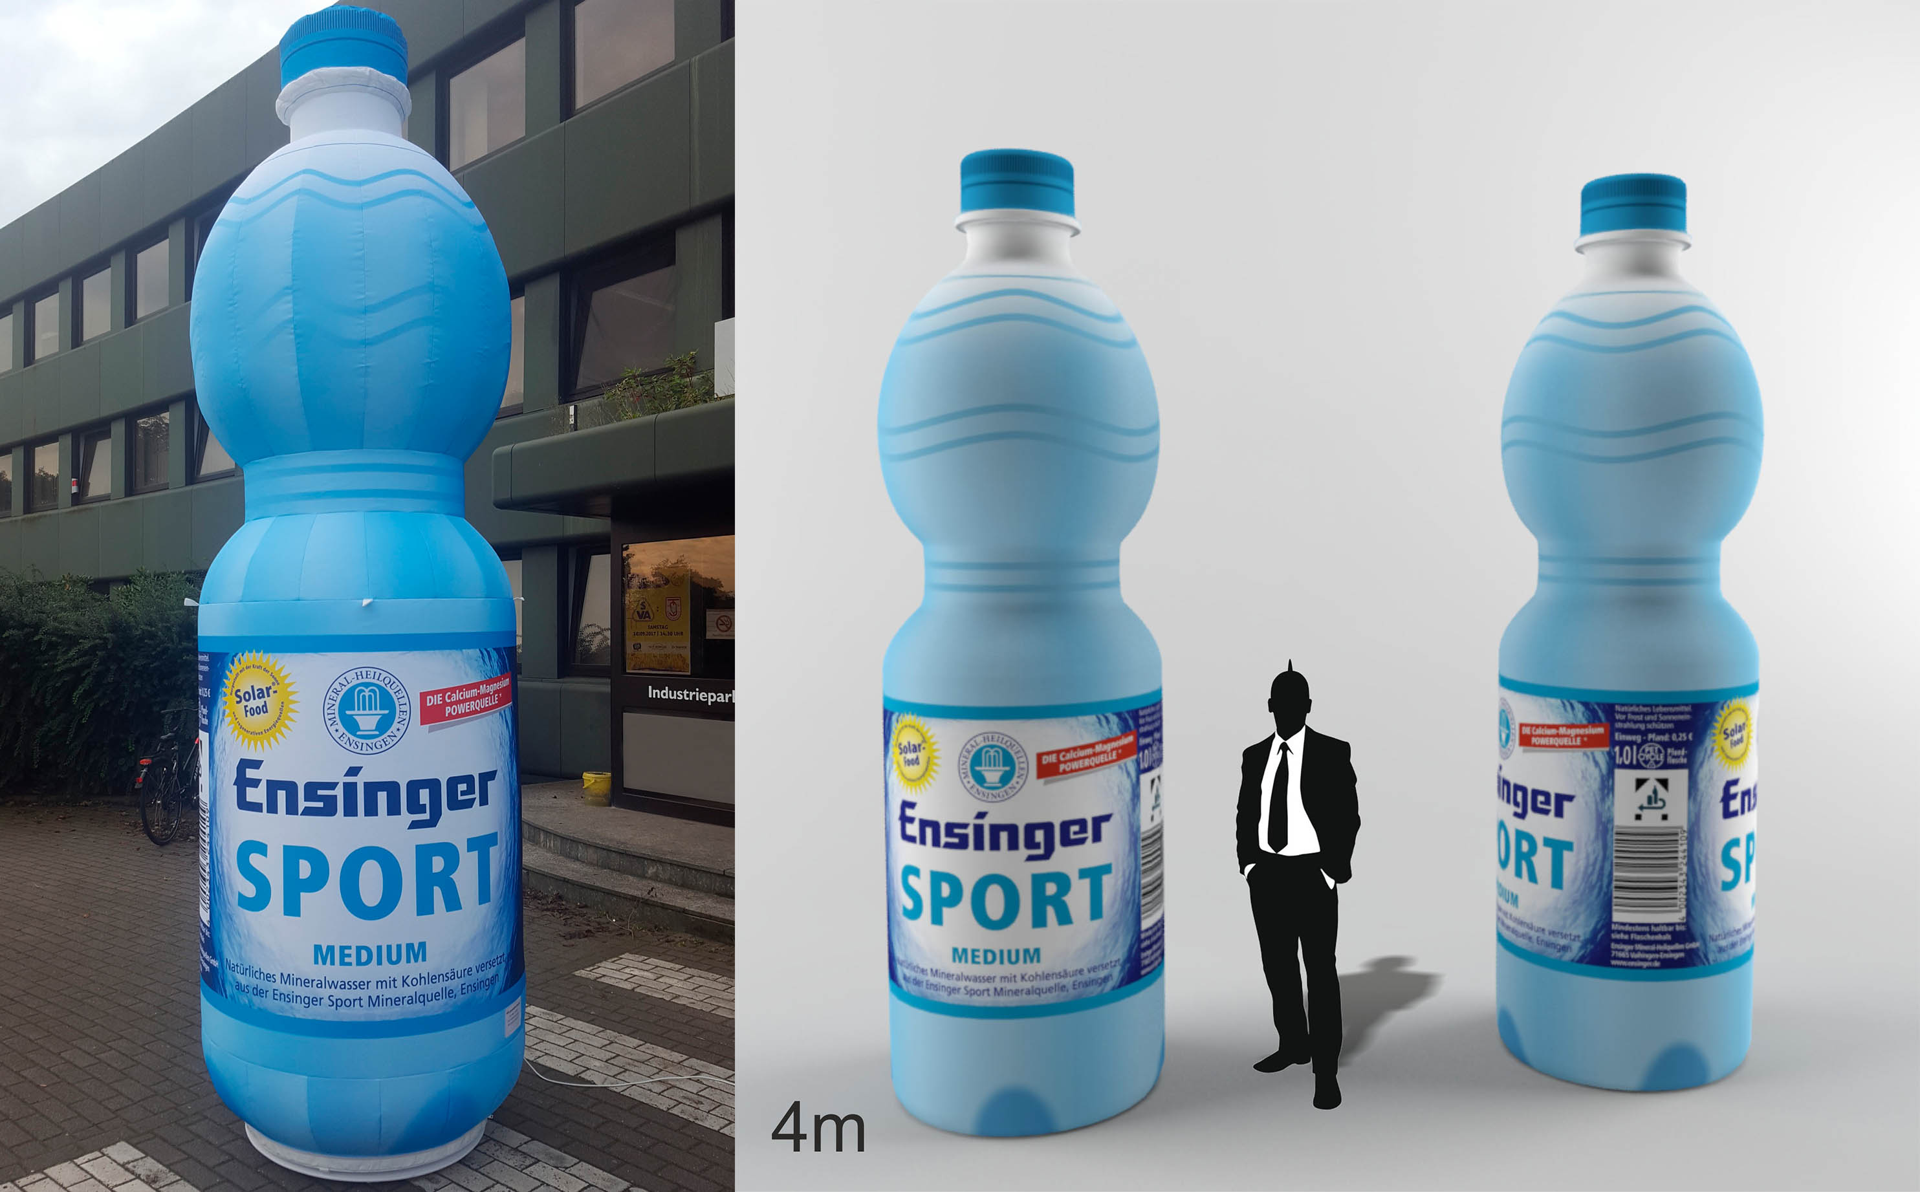 ensinger-sport-bottle-flask-inflatable